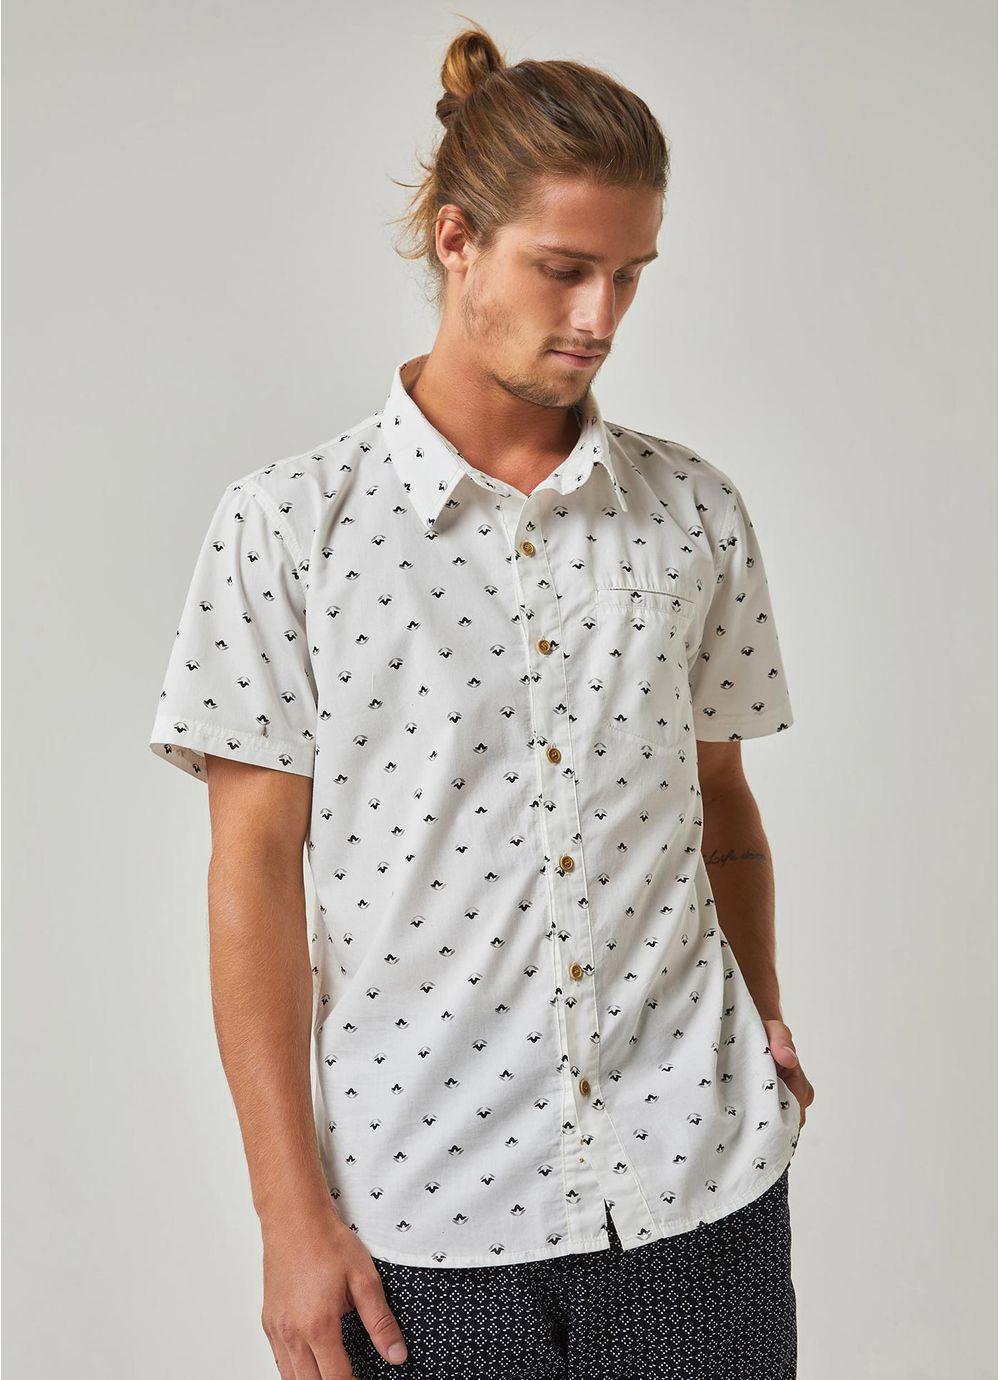 564137a63 Camisa manga curta estampada pattern mini icons BRANCO - Compre ...